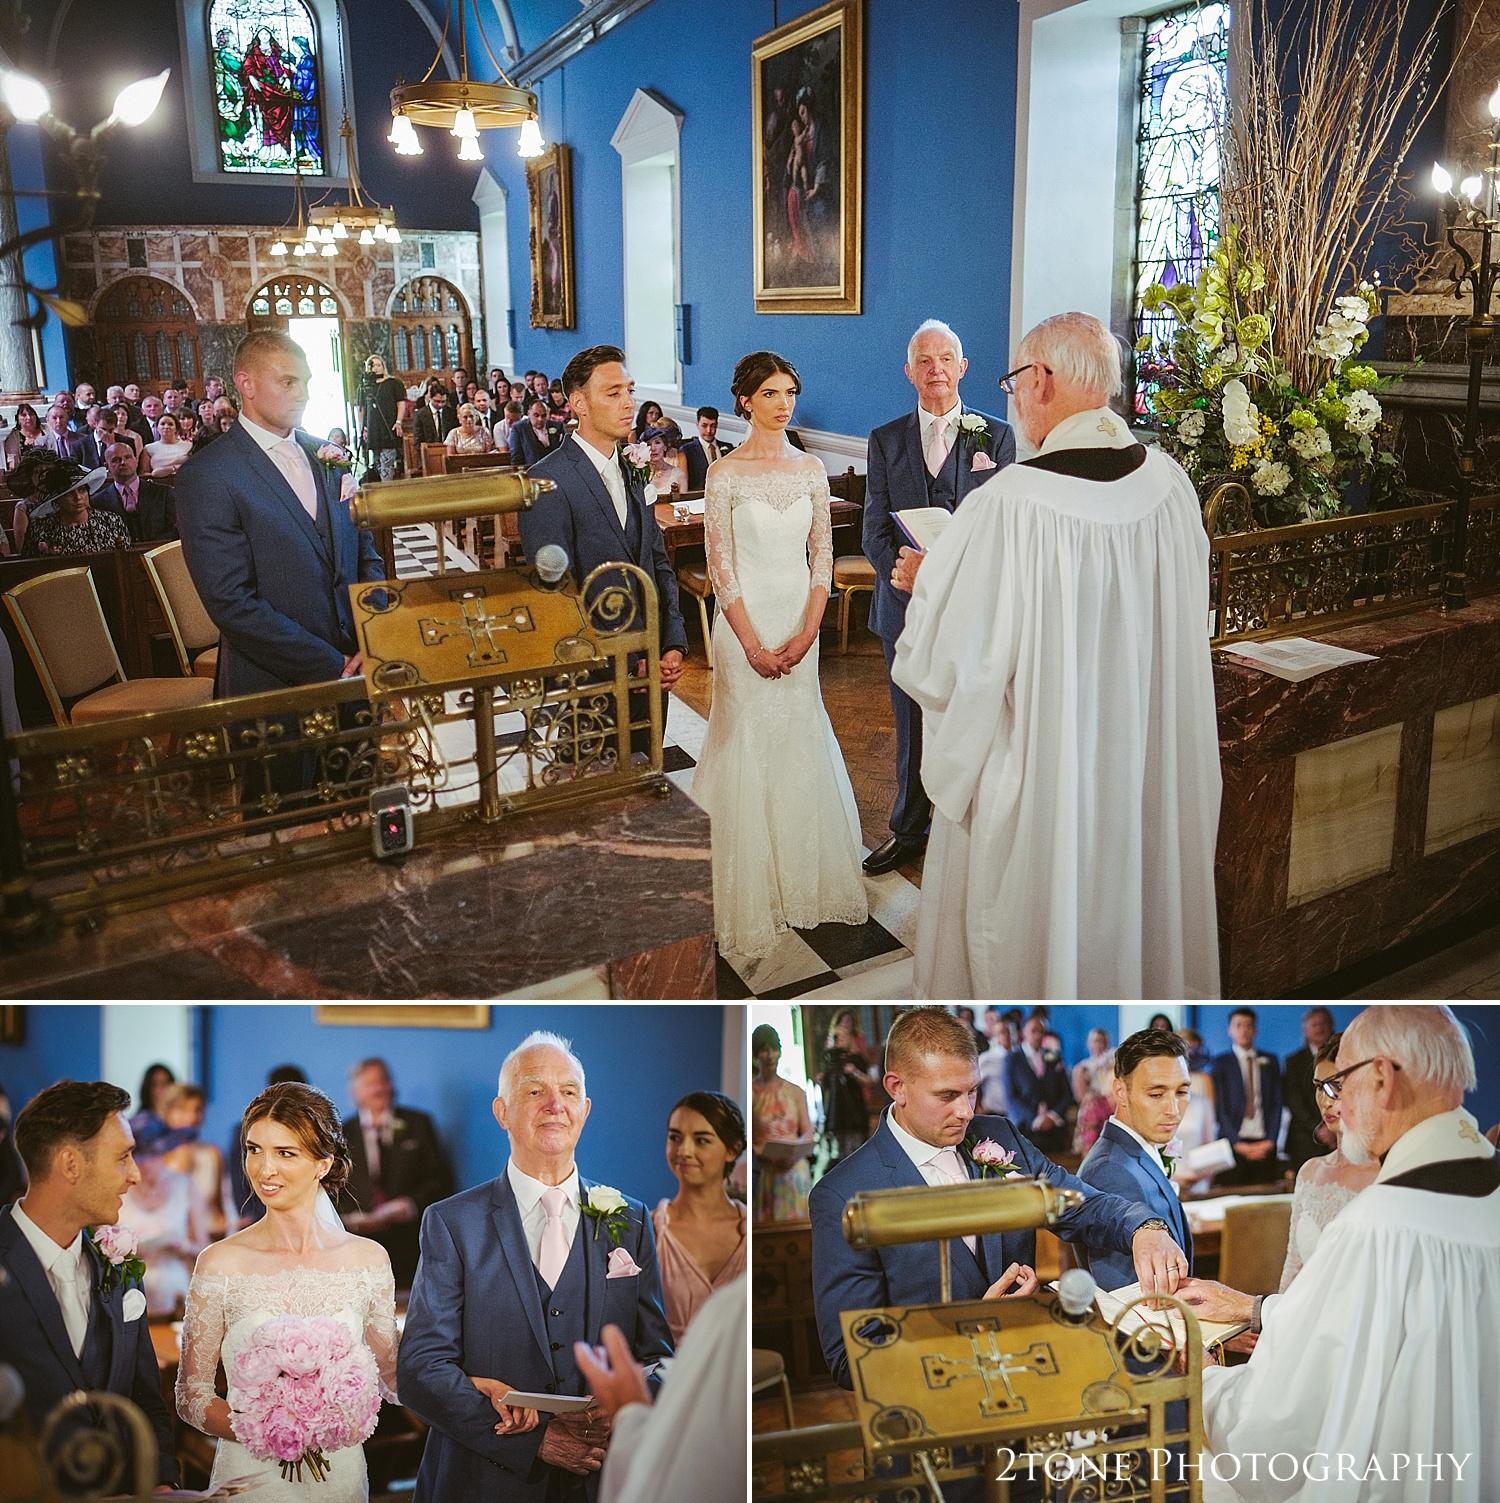 Wynyard Hall wedding ceremony by Durham based wedding photographers www.2tonephotography.co.uk